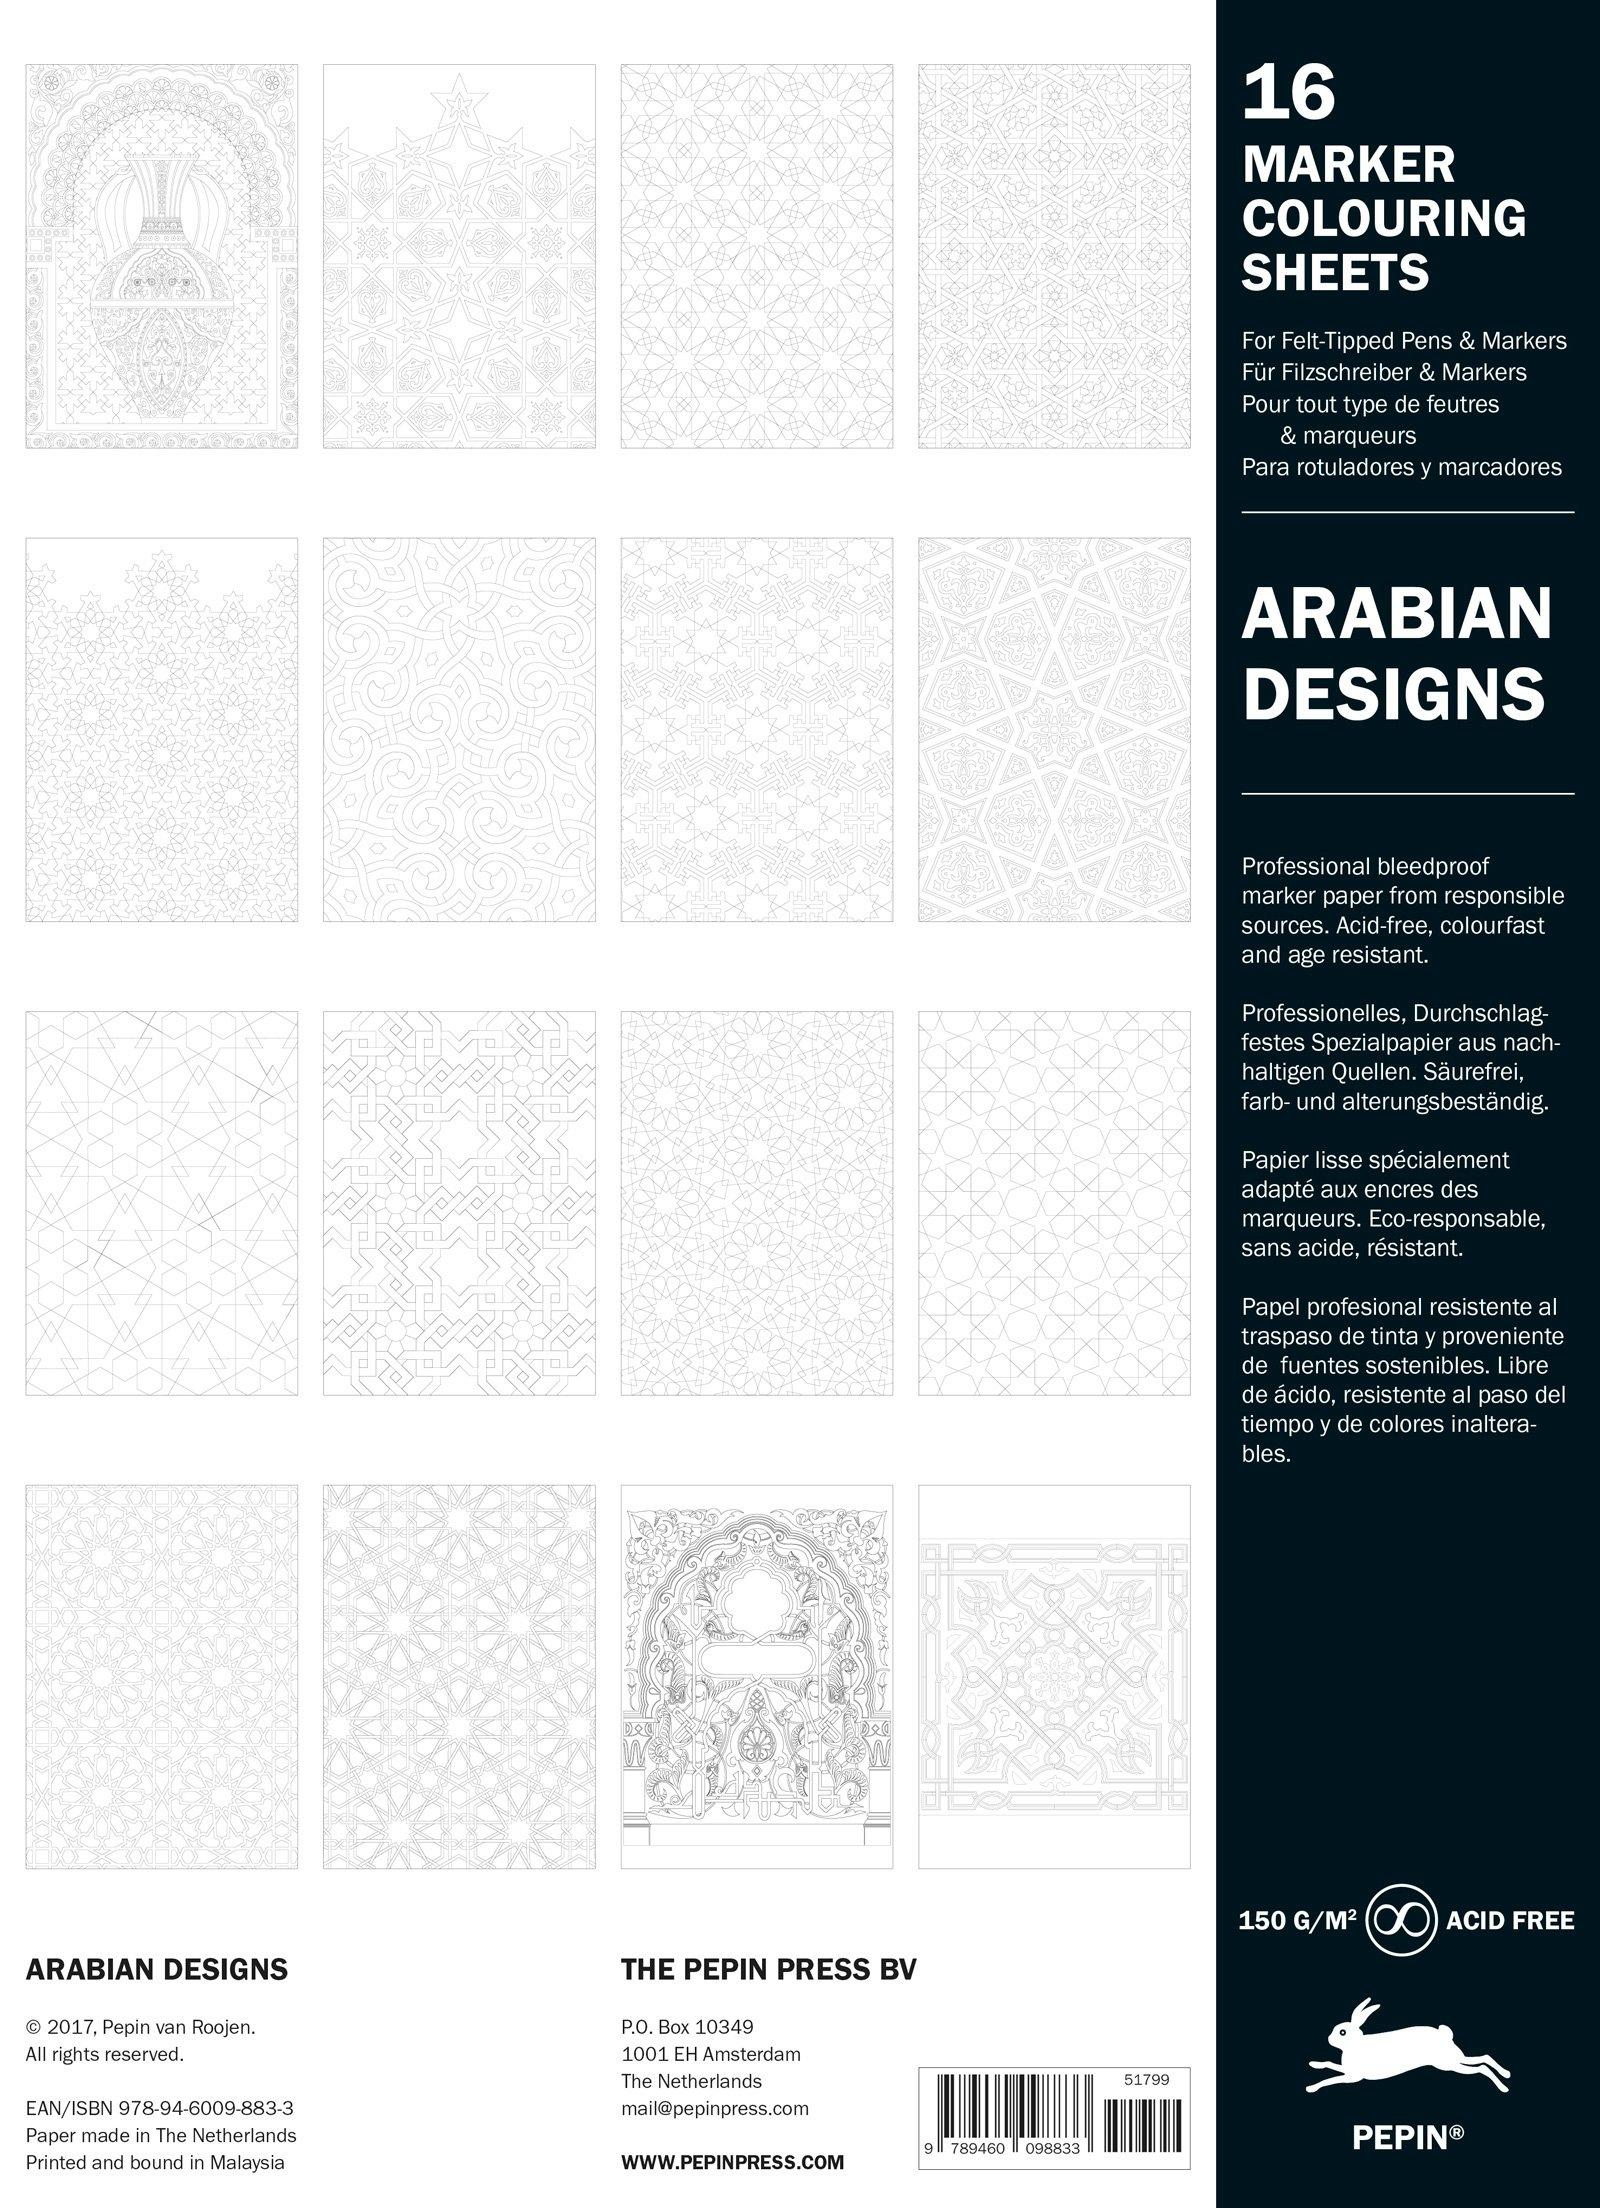 Arabian Patterns: Marker Colouring Sheets Book: 16 marker